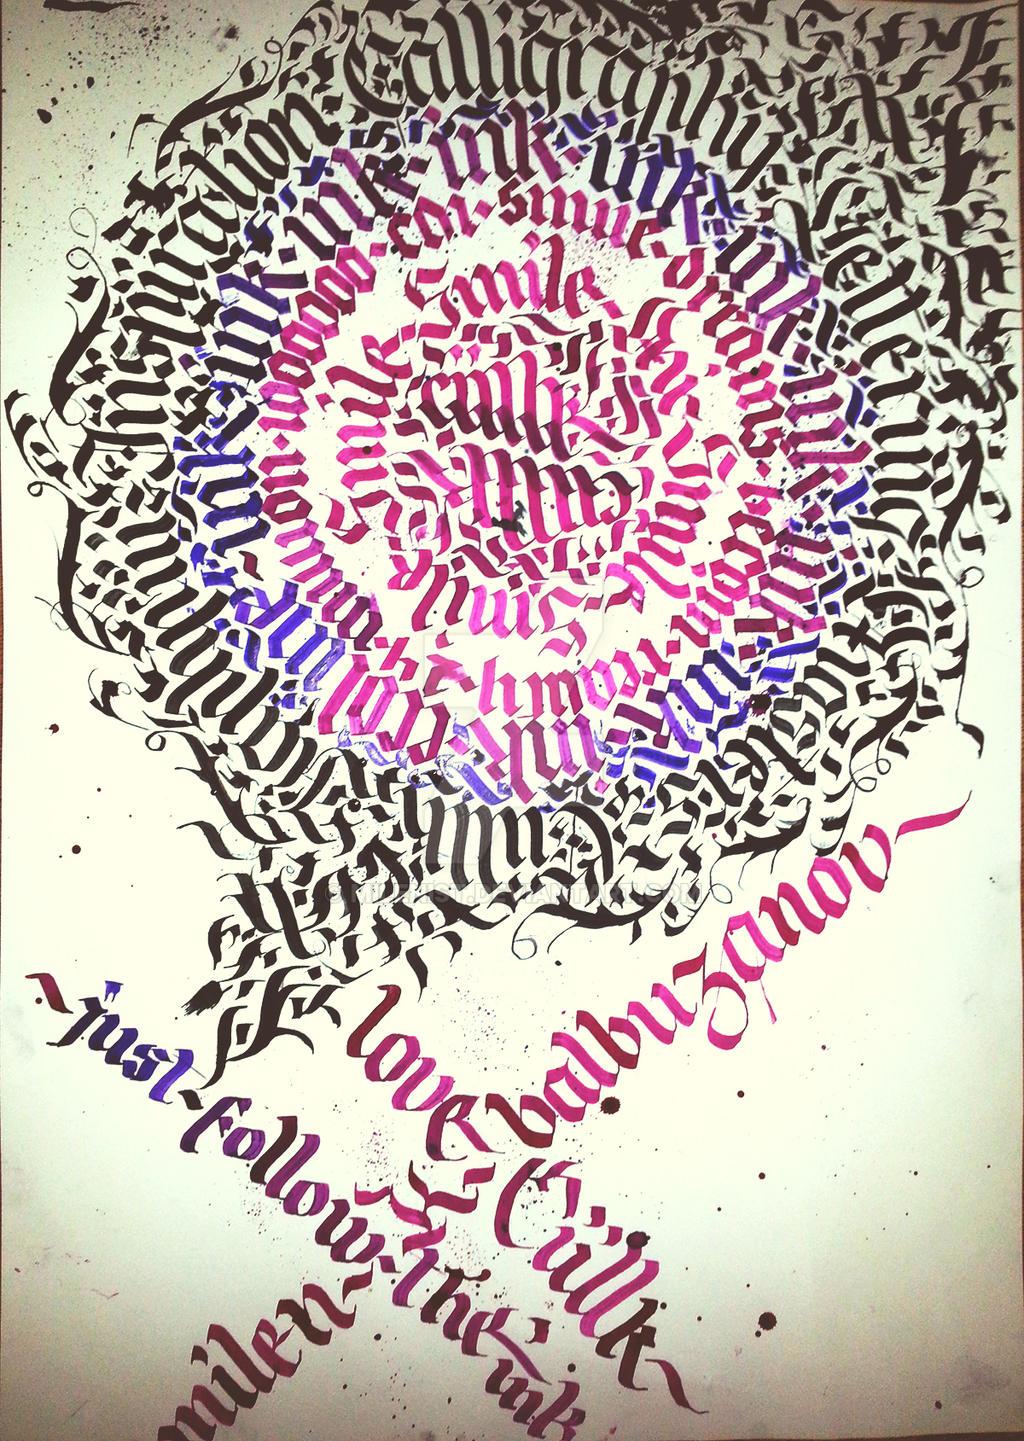 Ciillk Calligraphy Lettering Calligram by Milenist